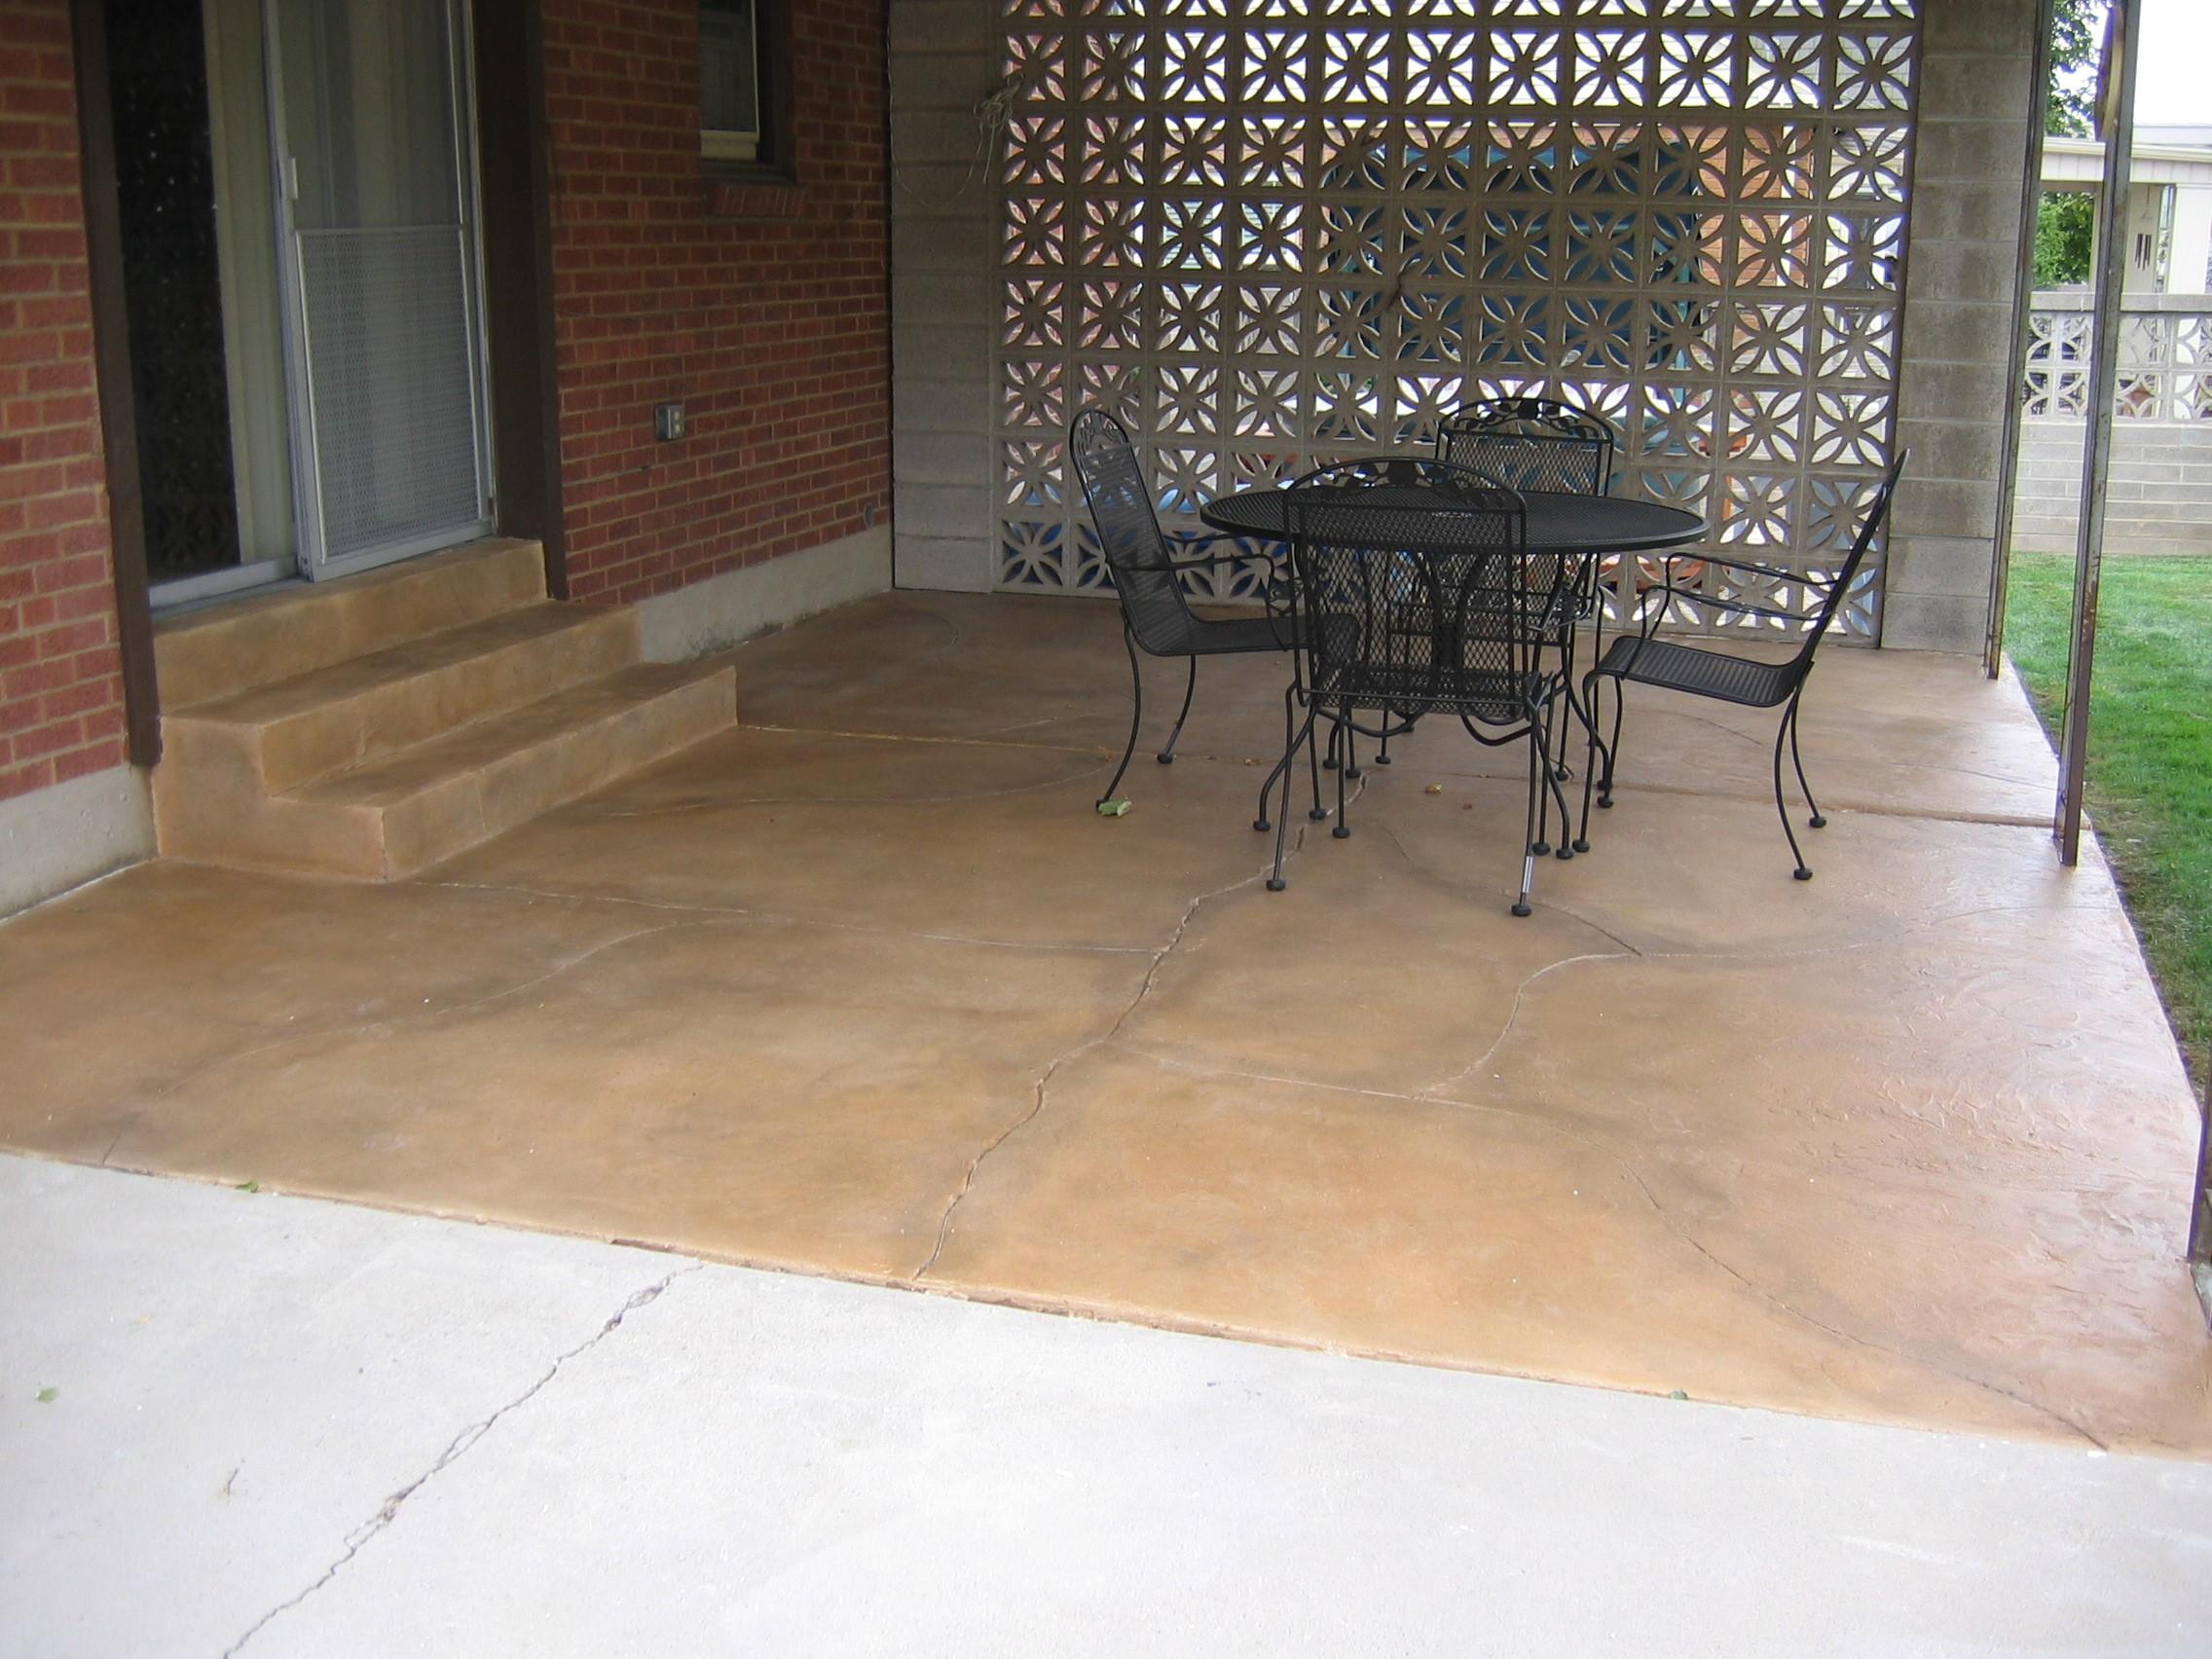 Patio Cracked Pattern Concrete Design Systems Salt